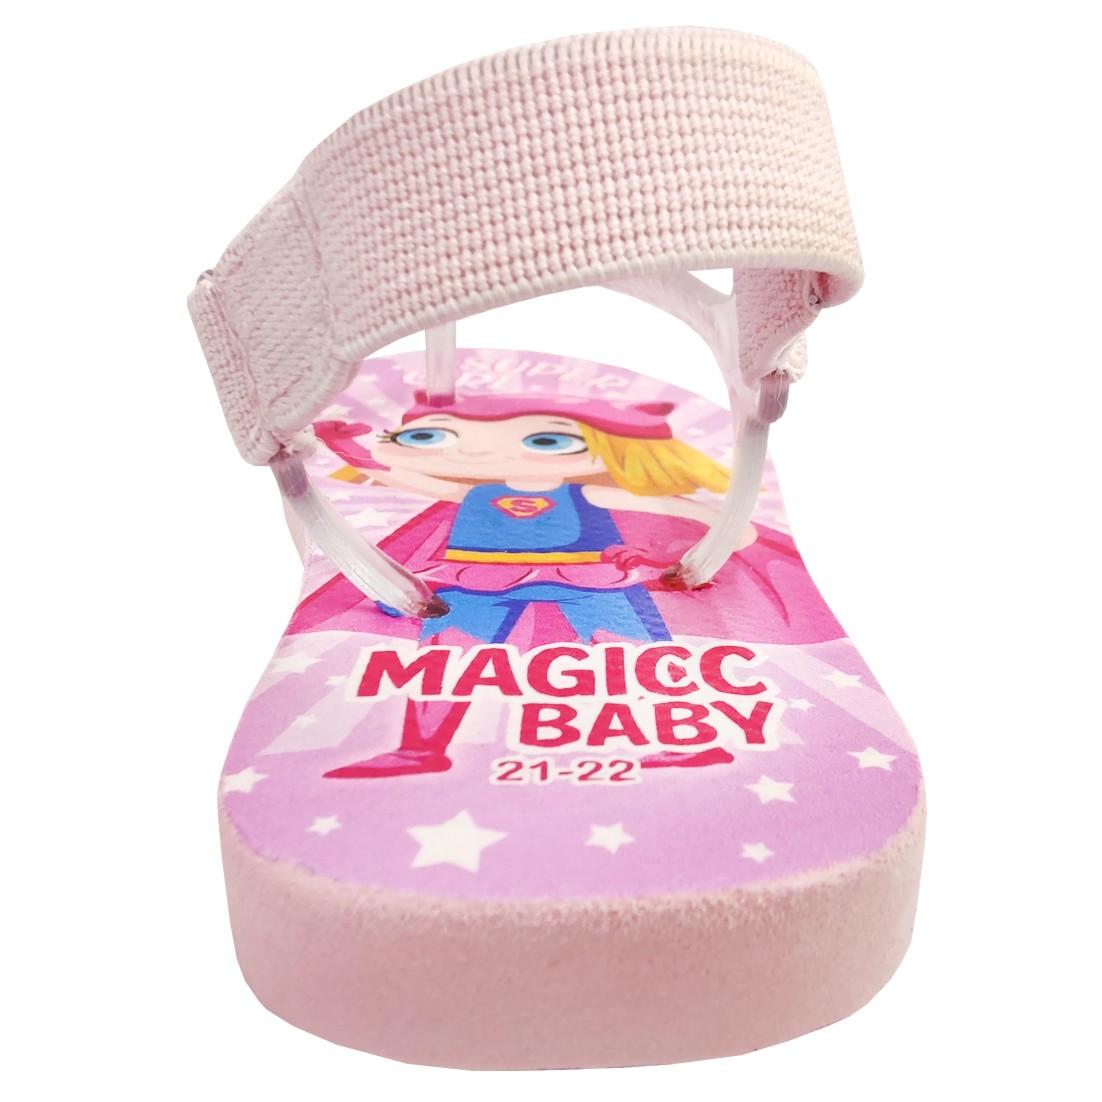 Chinelo Menina Bebê Sandália Super Girl Magicc Baby